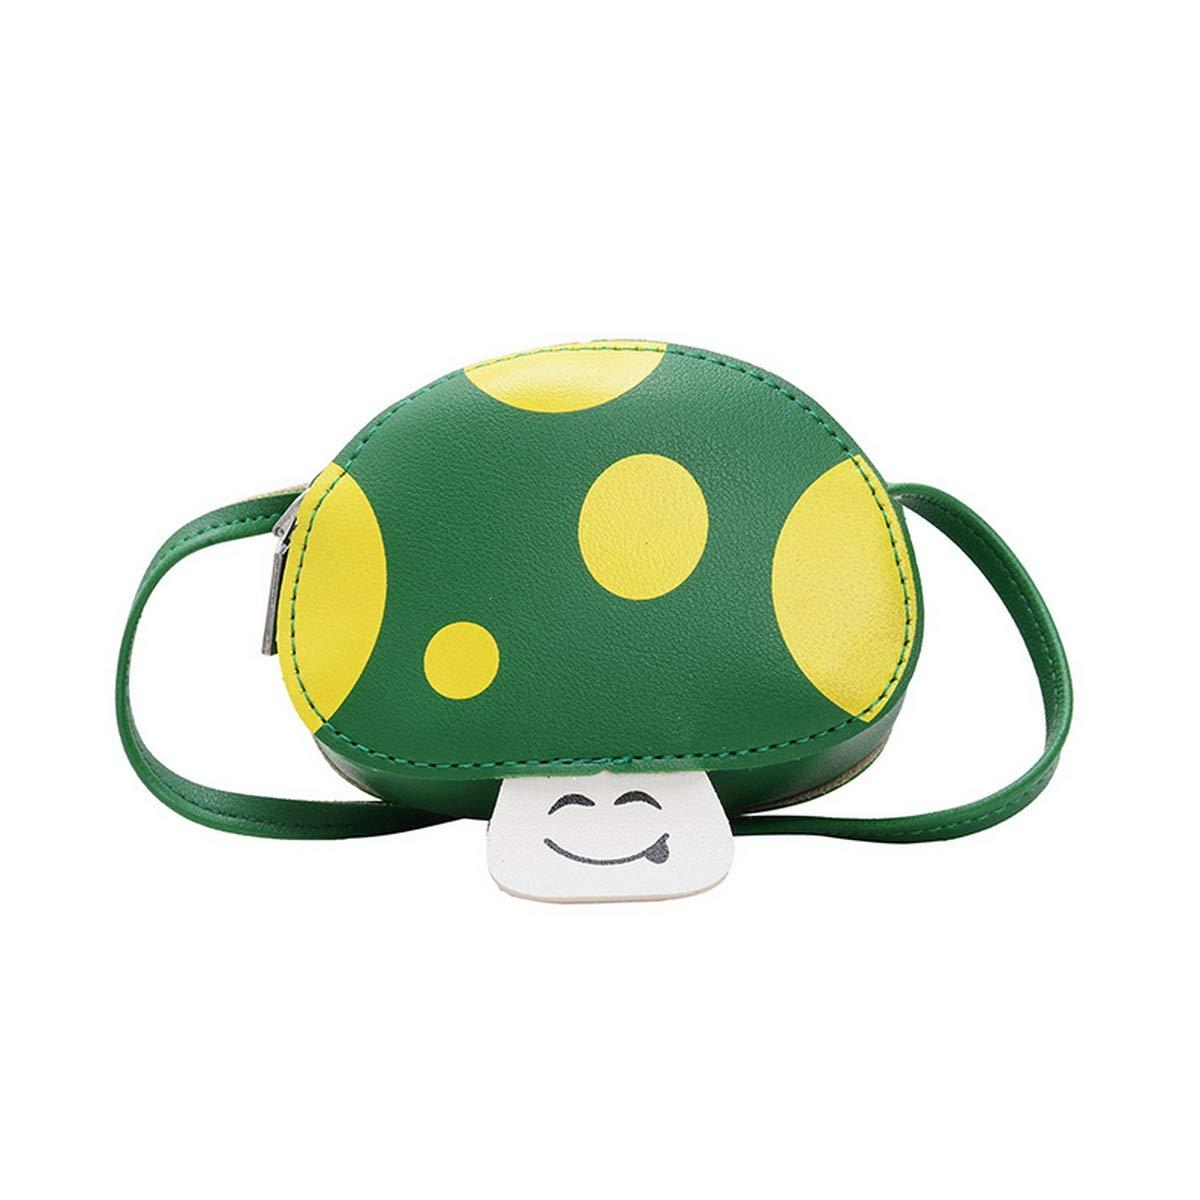 Girls Crossbody Bag Cute Cartoon Mushrooms Shape Shoulder Purses Chic Handbag